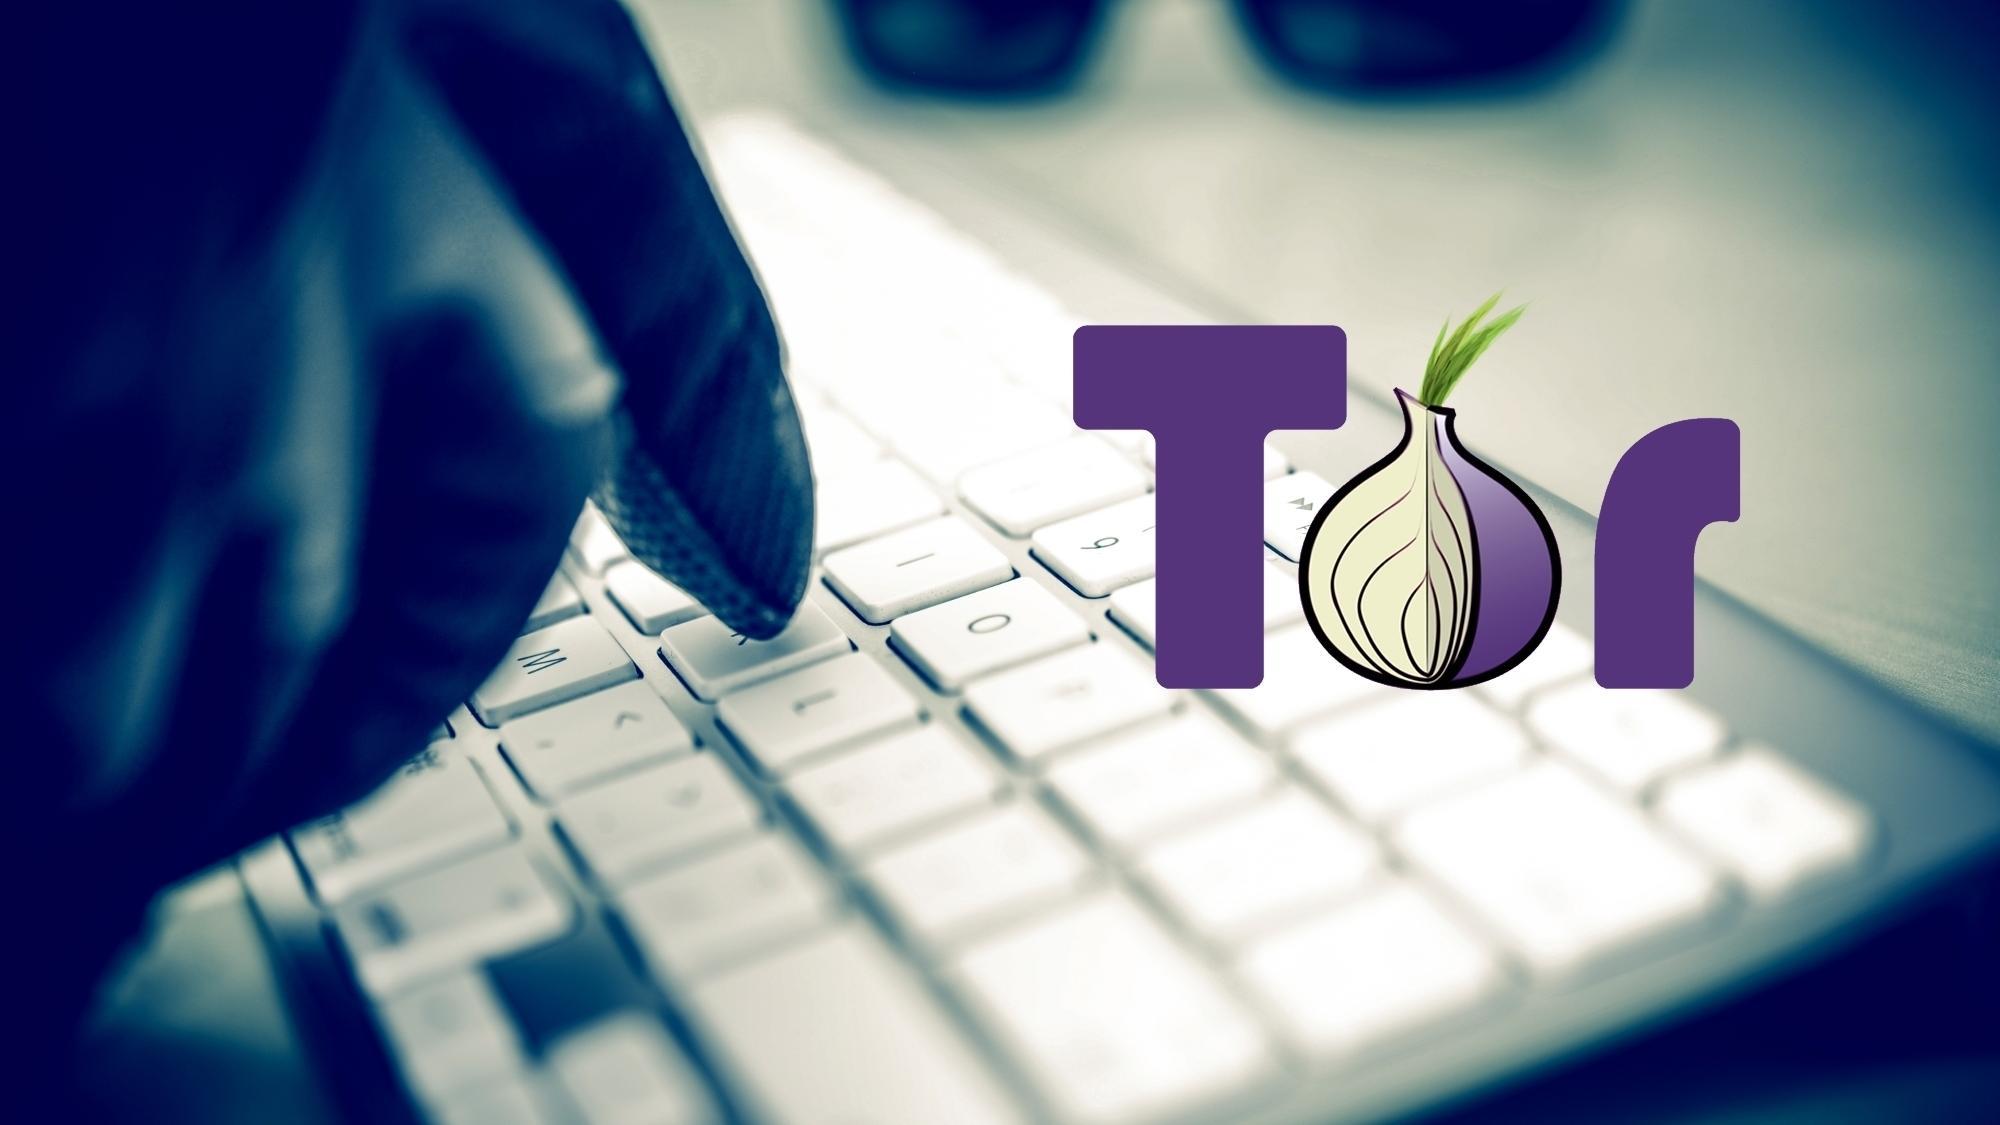 PlayStation Network-hackerne har nå angrepet Tor-tjenesten